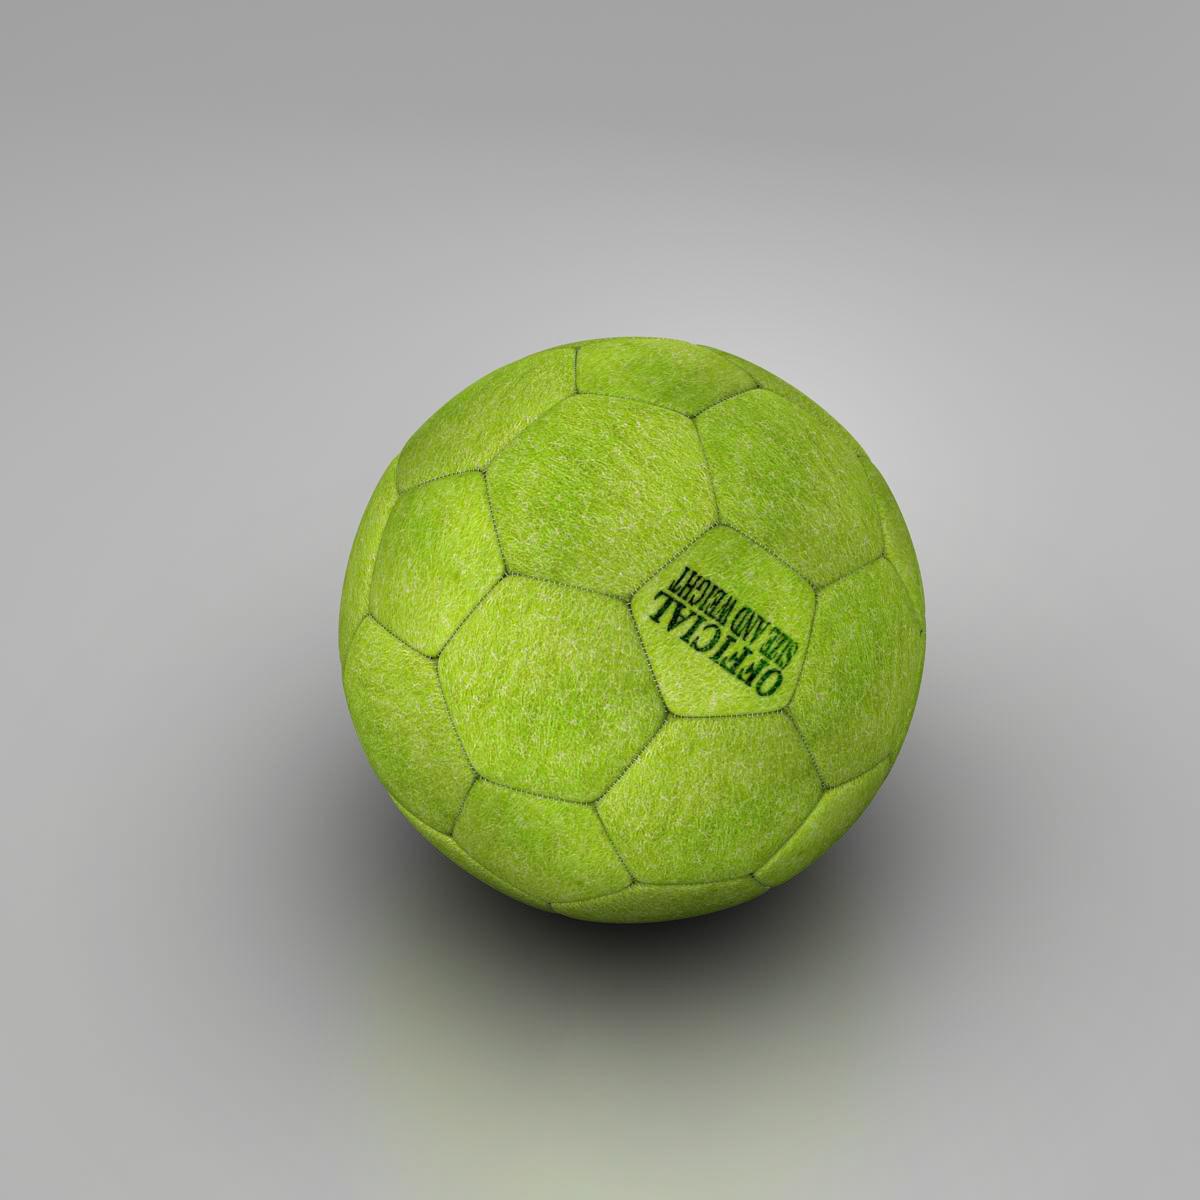 soccerball дотроо 3d загвар 3ds max fbx c4d м mb obj 205139